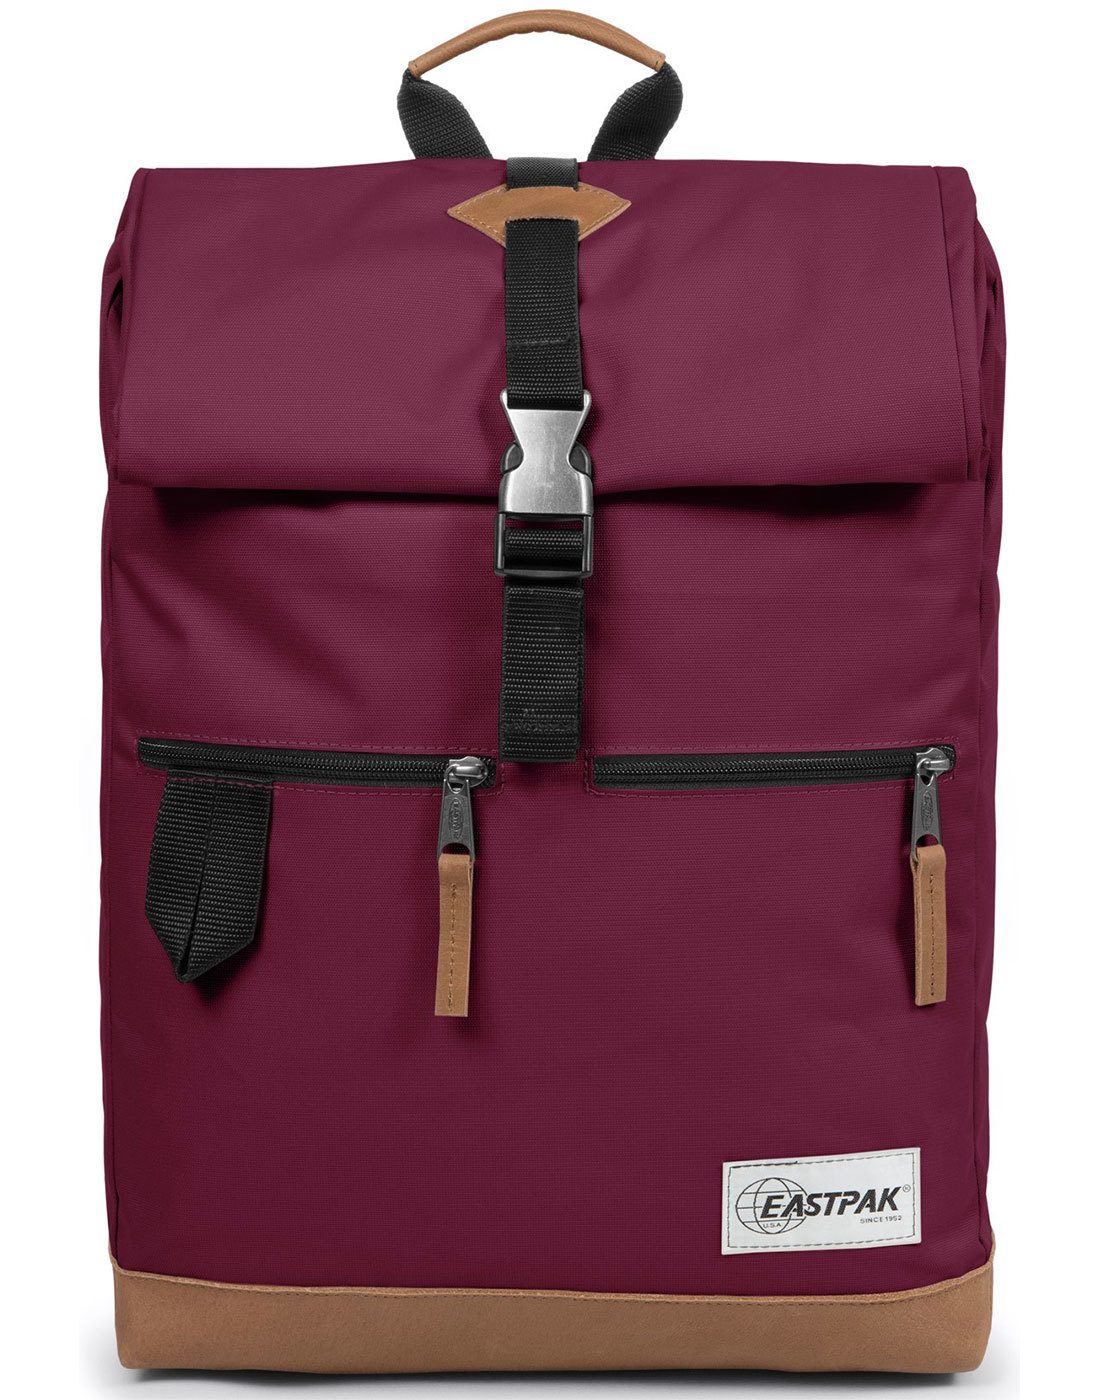 Macnee EASTPAK Retro Military Laptop Backpack (IM)